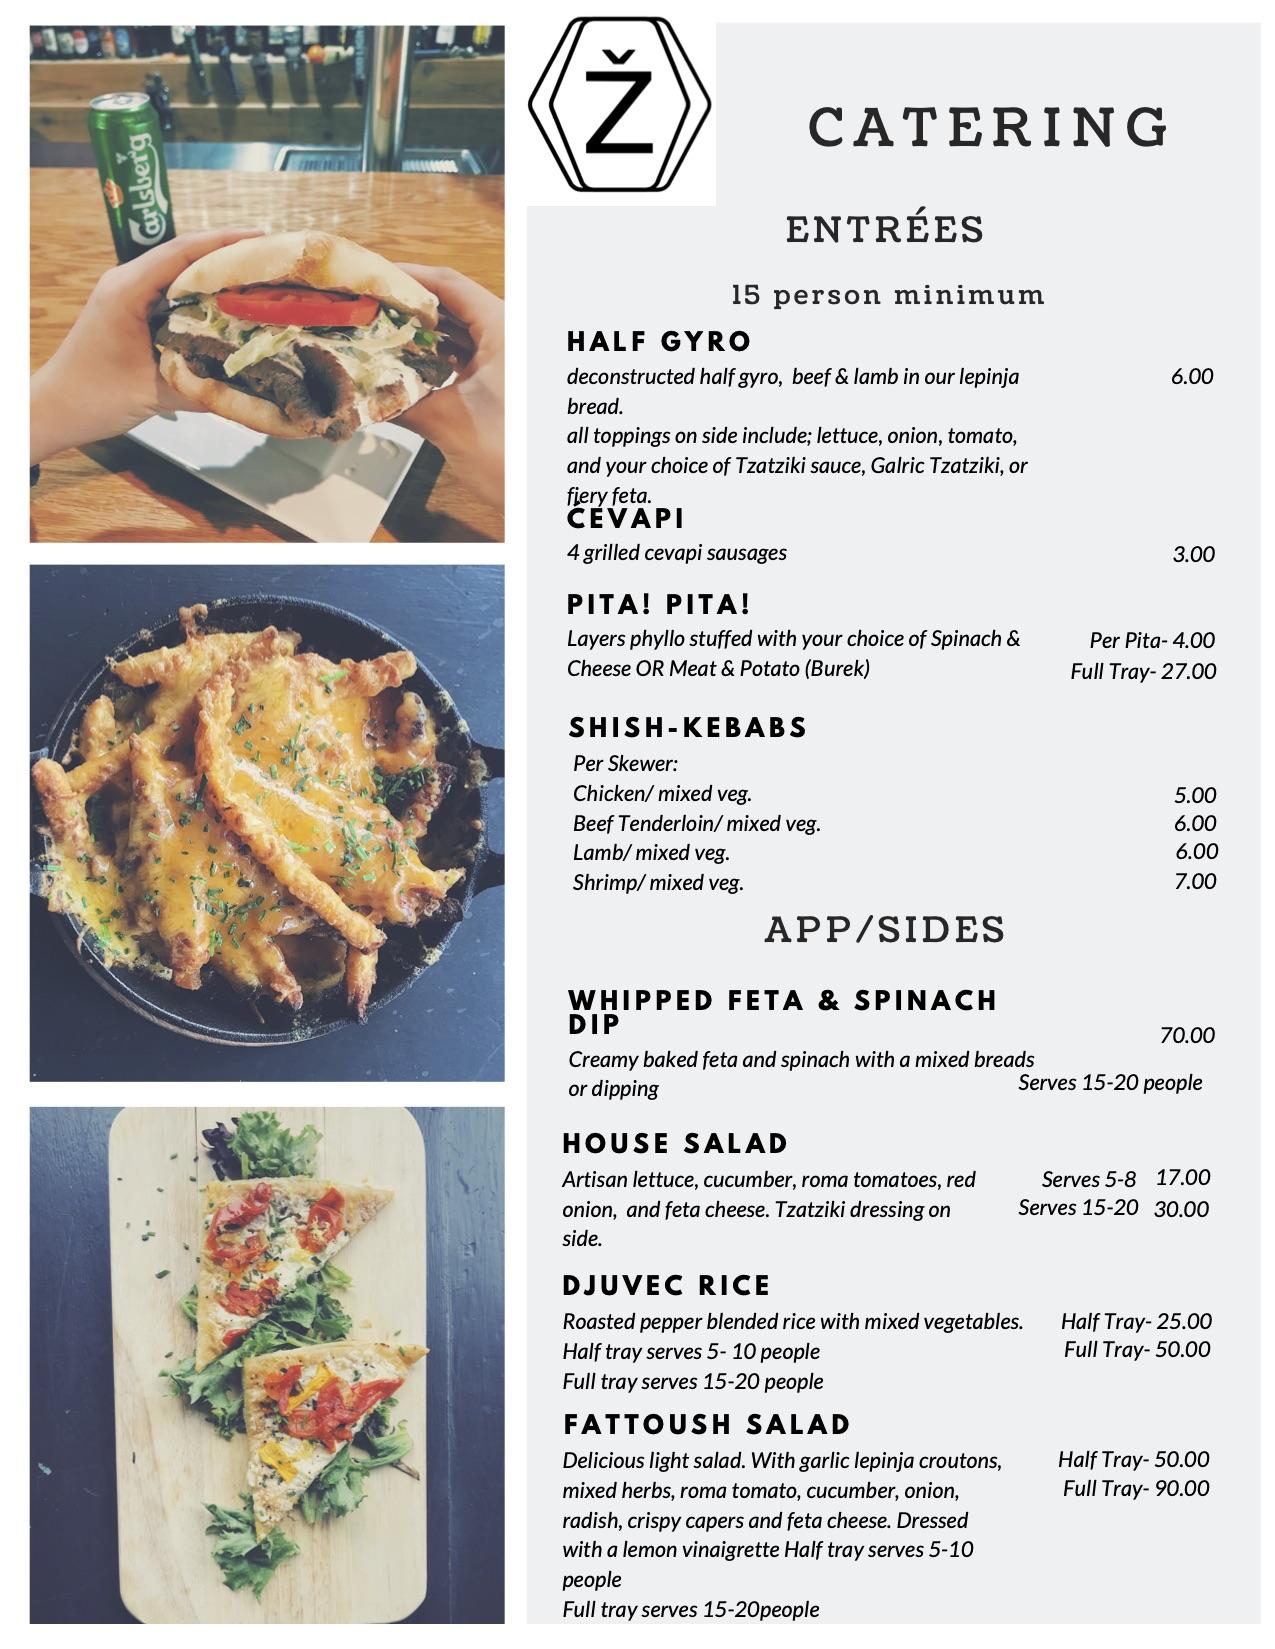 zivio catering menu .jpg